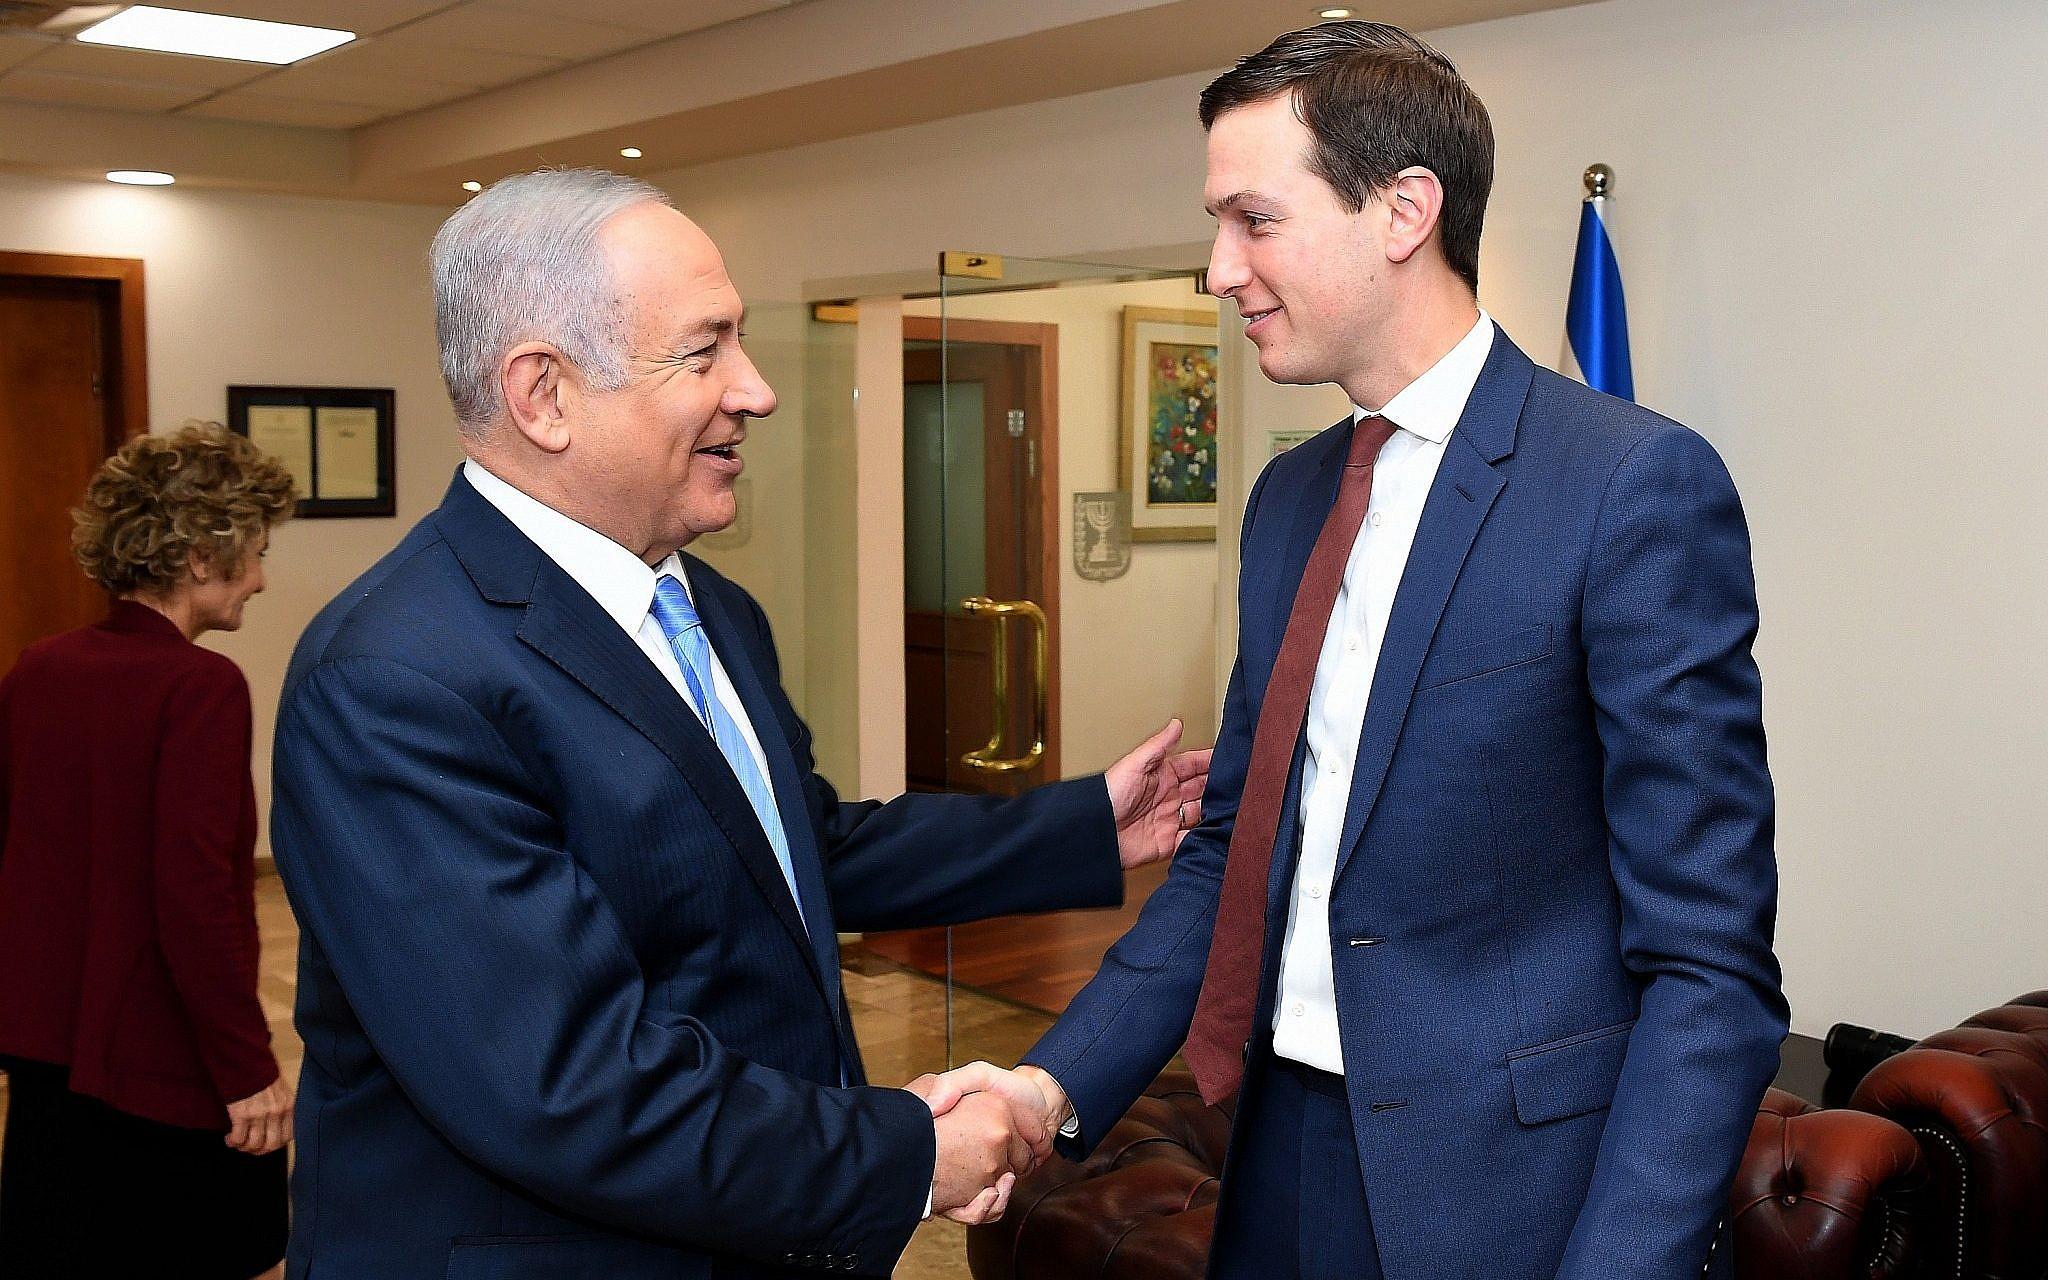 Resultado de imagen de Jared Kushner netanyahu